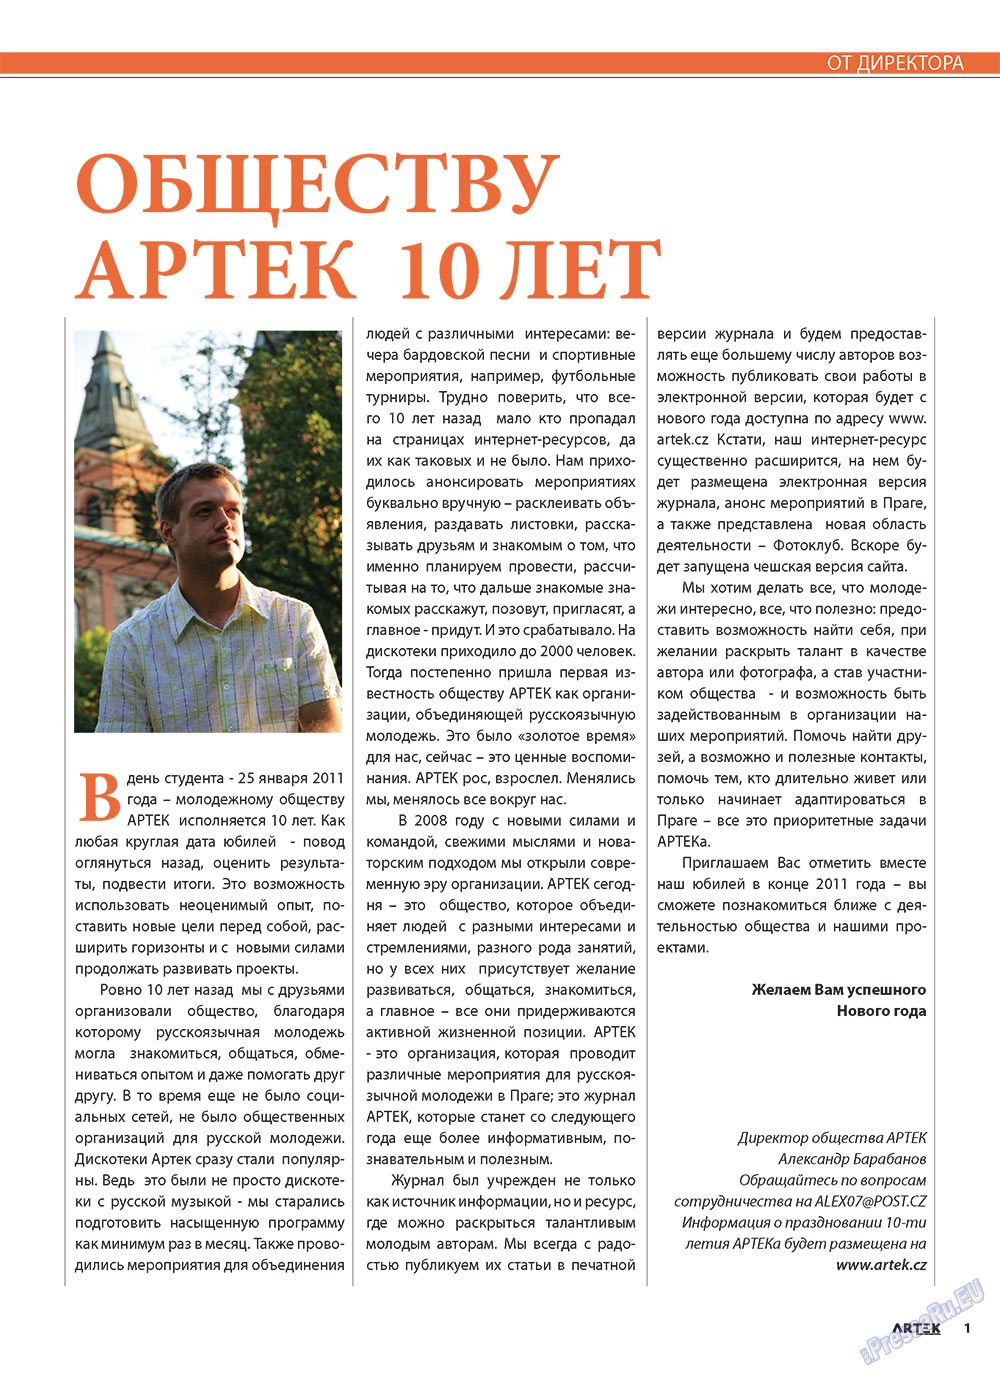 Артек (журнал). 2010 год, номер 6, стр. 3